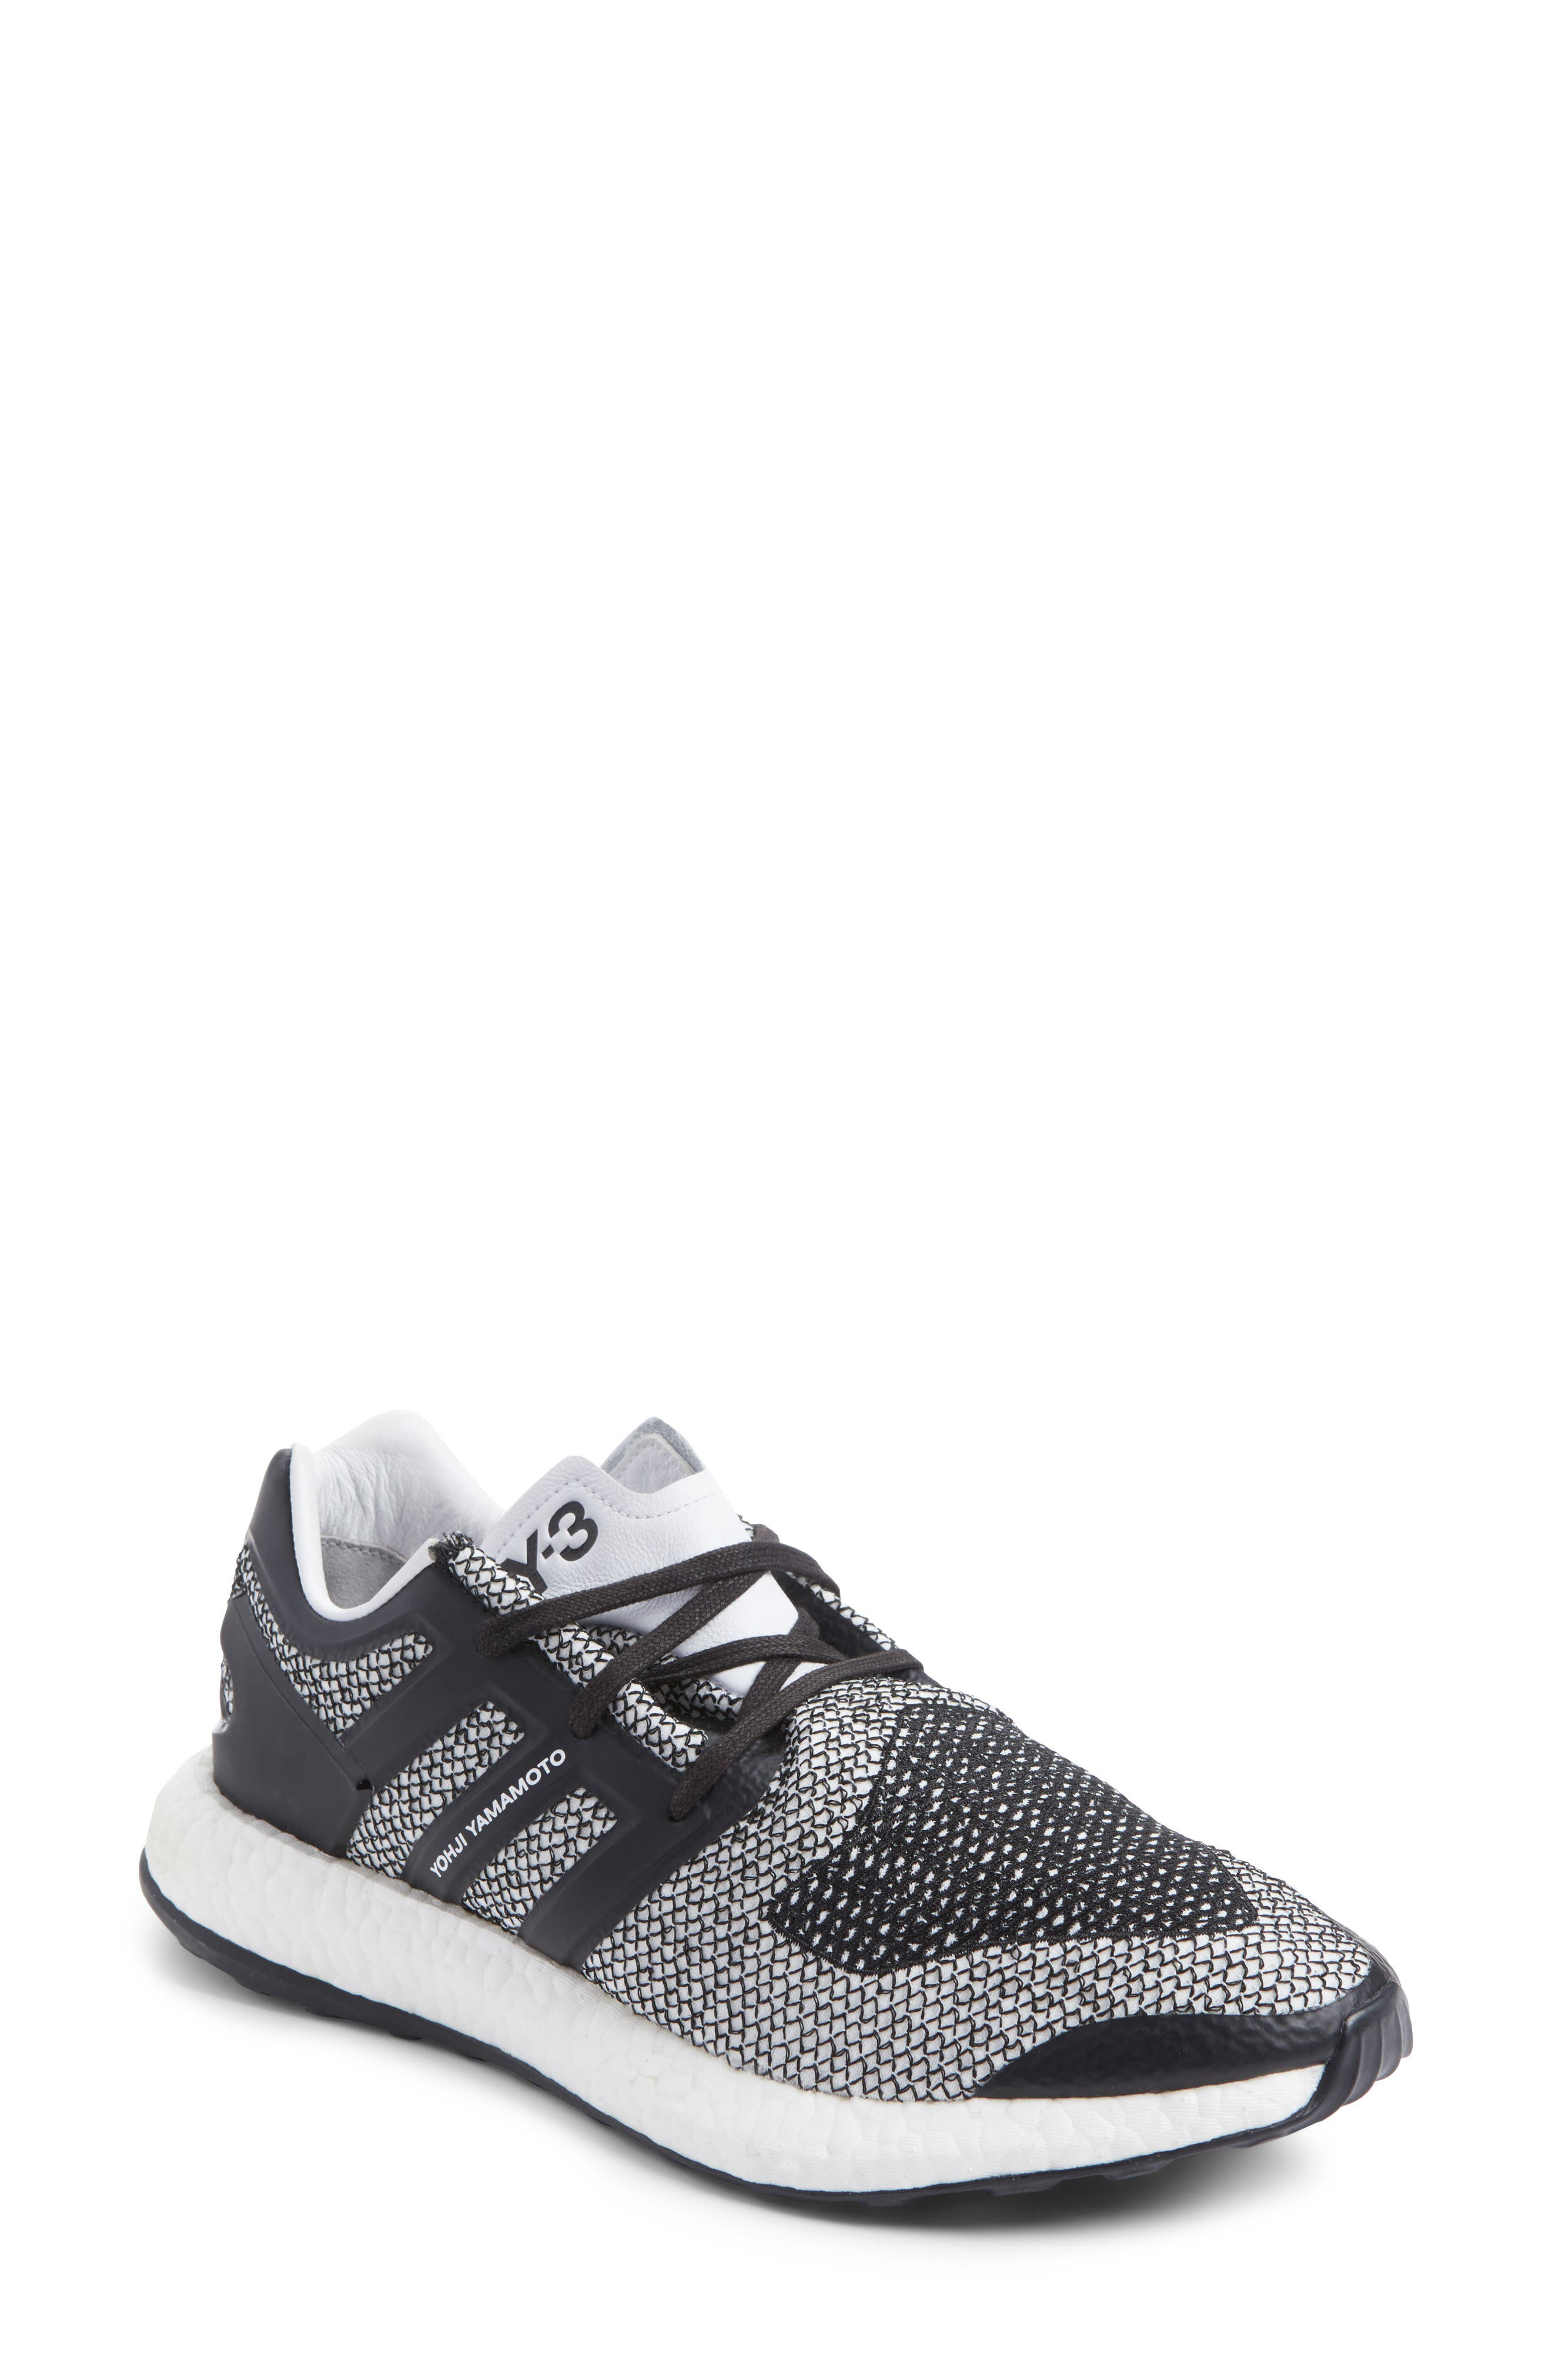 PureBoost Sneaker,                             Main thumbnail 1, color,                             White/ Core Black